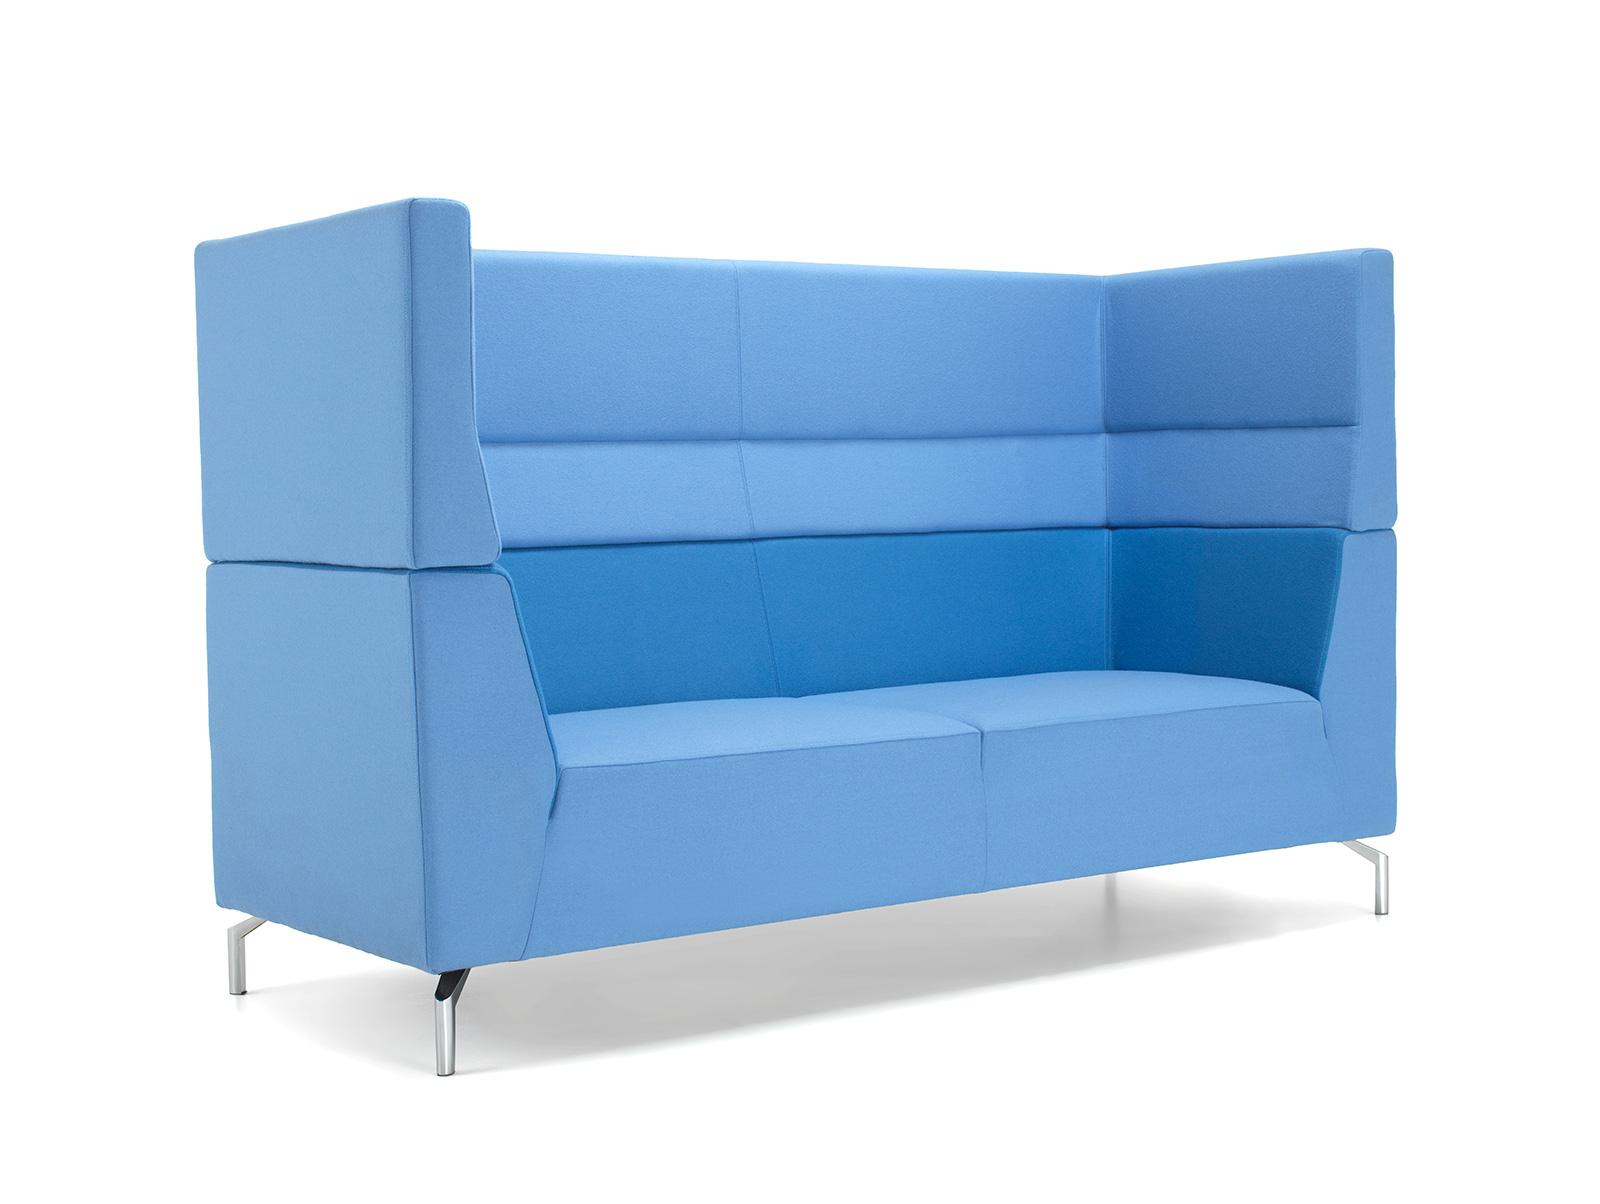 Alban High Seating